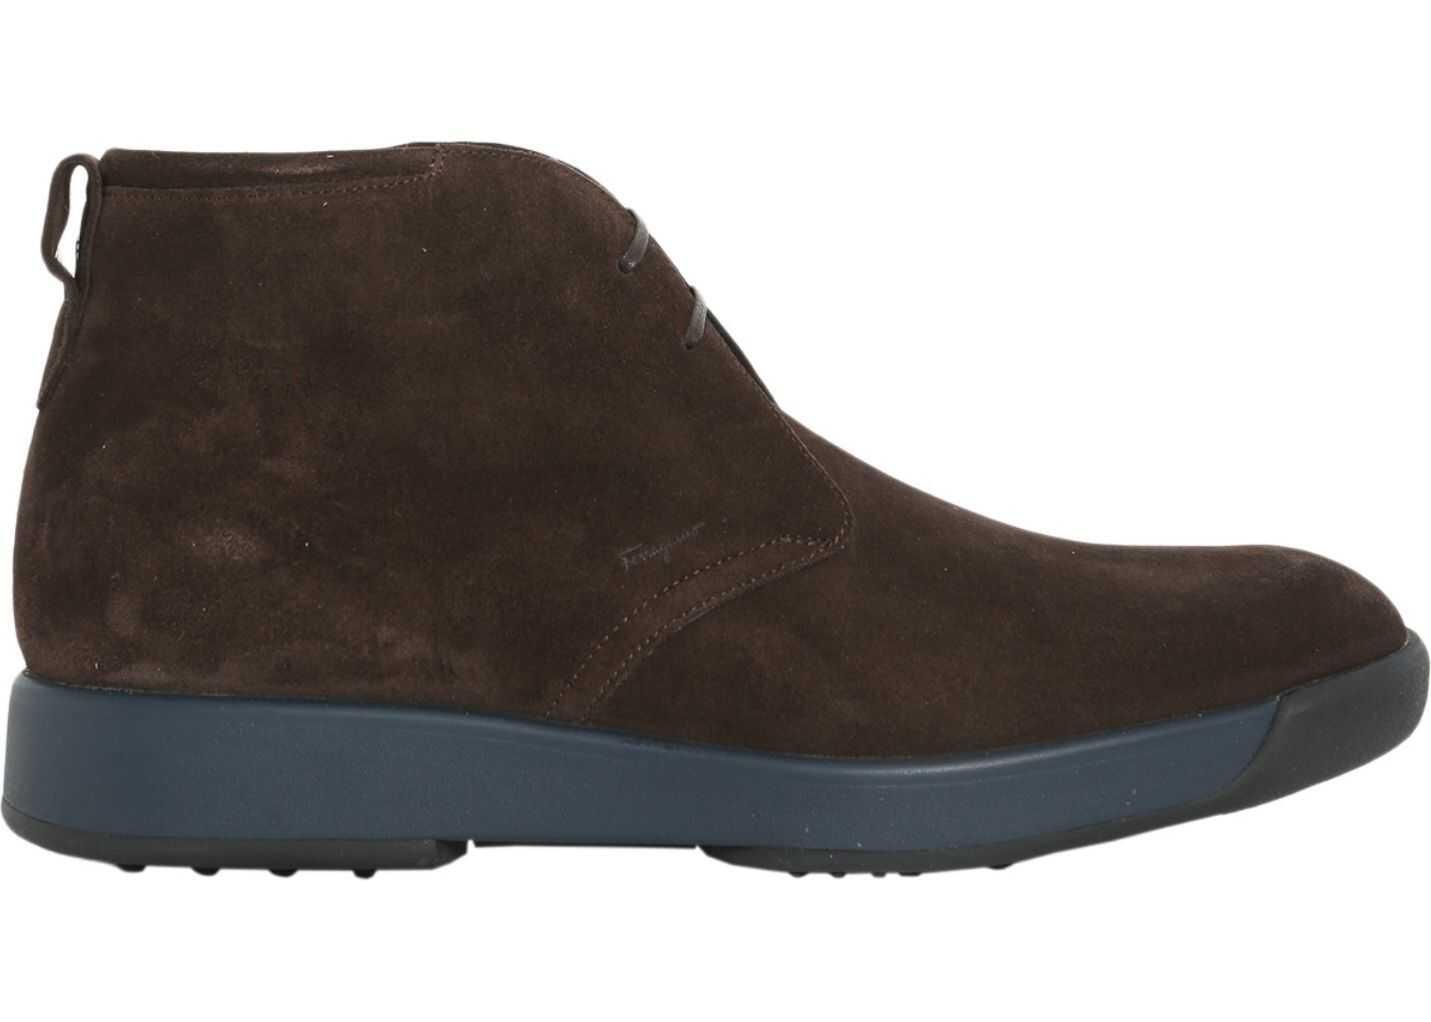 Salvatore Ferragamo Dorris Ankle Boots BROWN